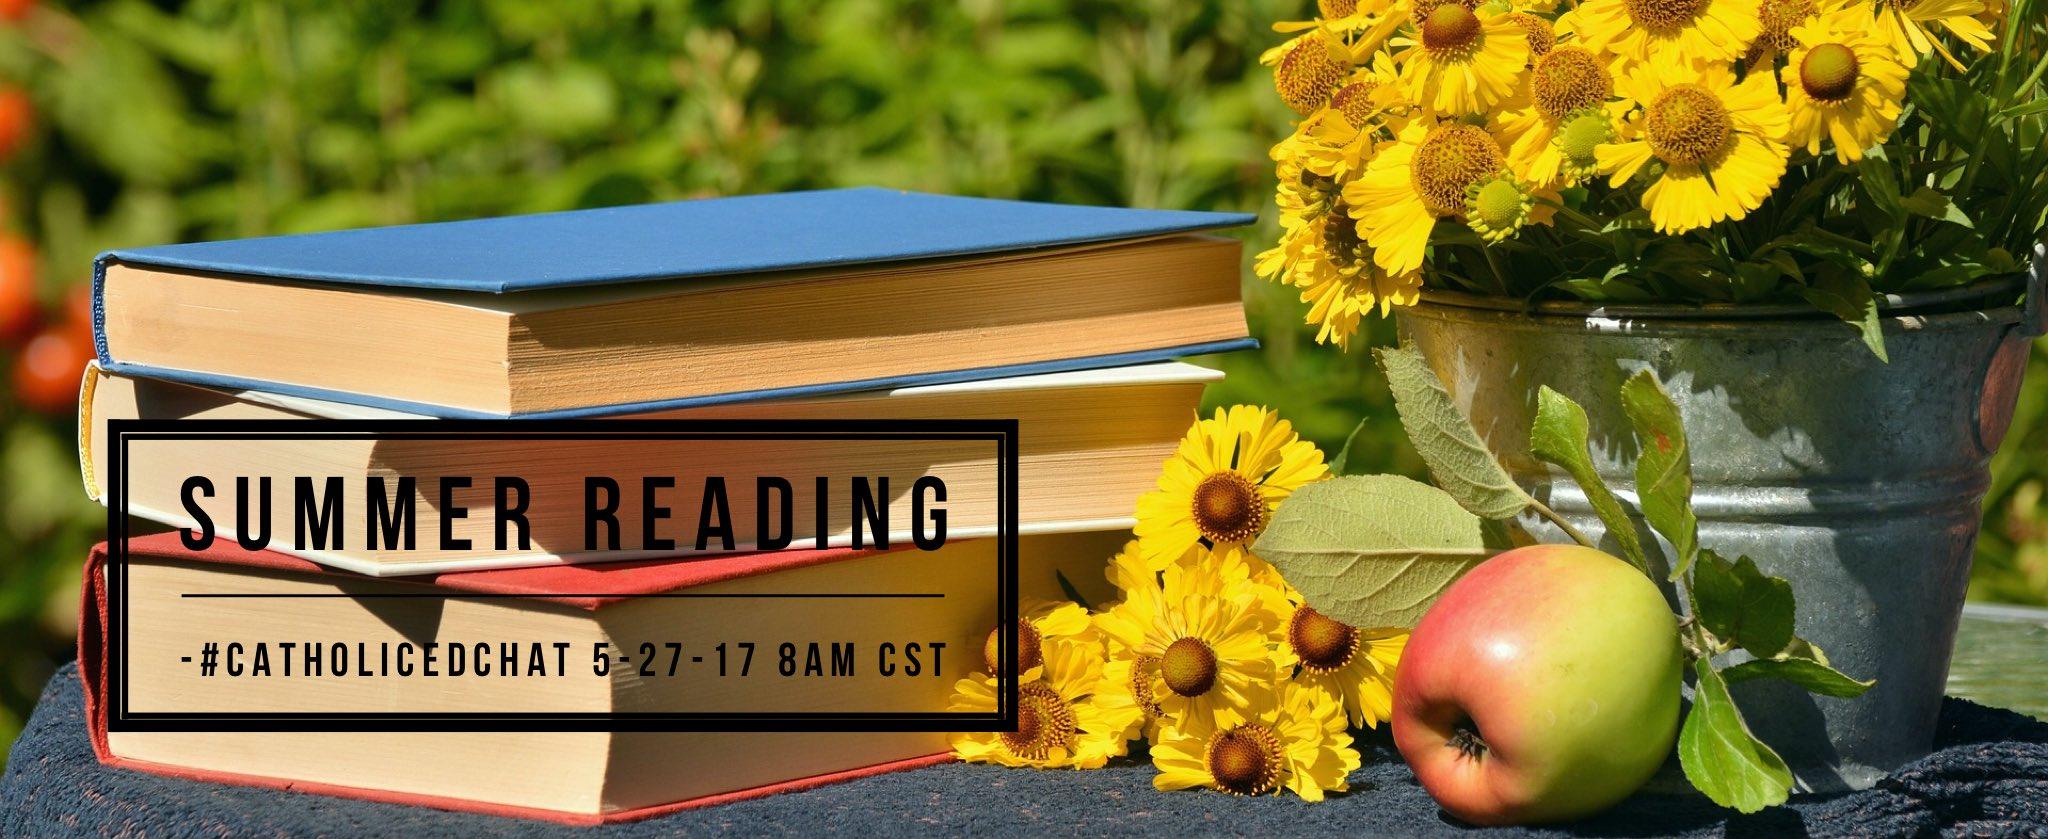 Thumbnail for Summer Reading 5-27-17 #CatholicEdChat